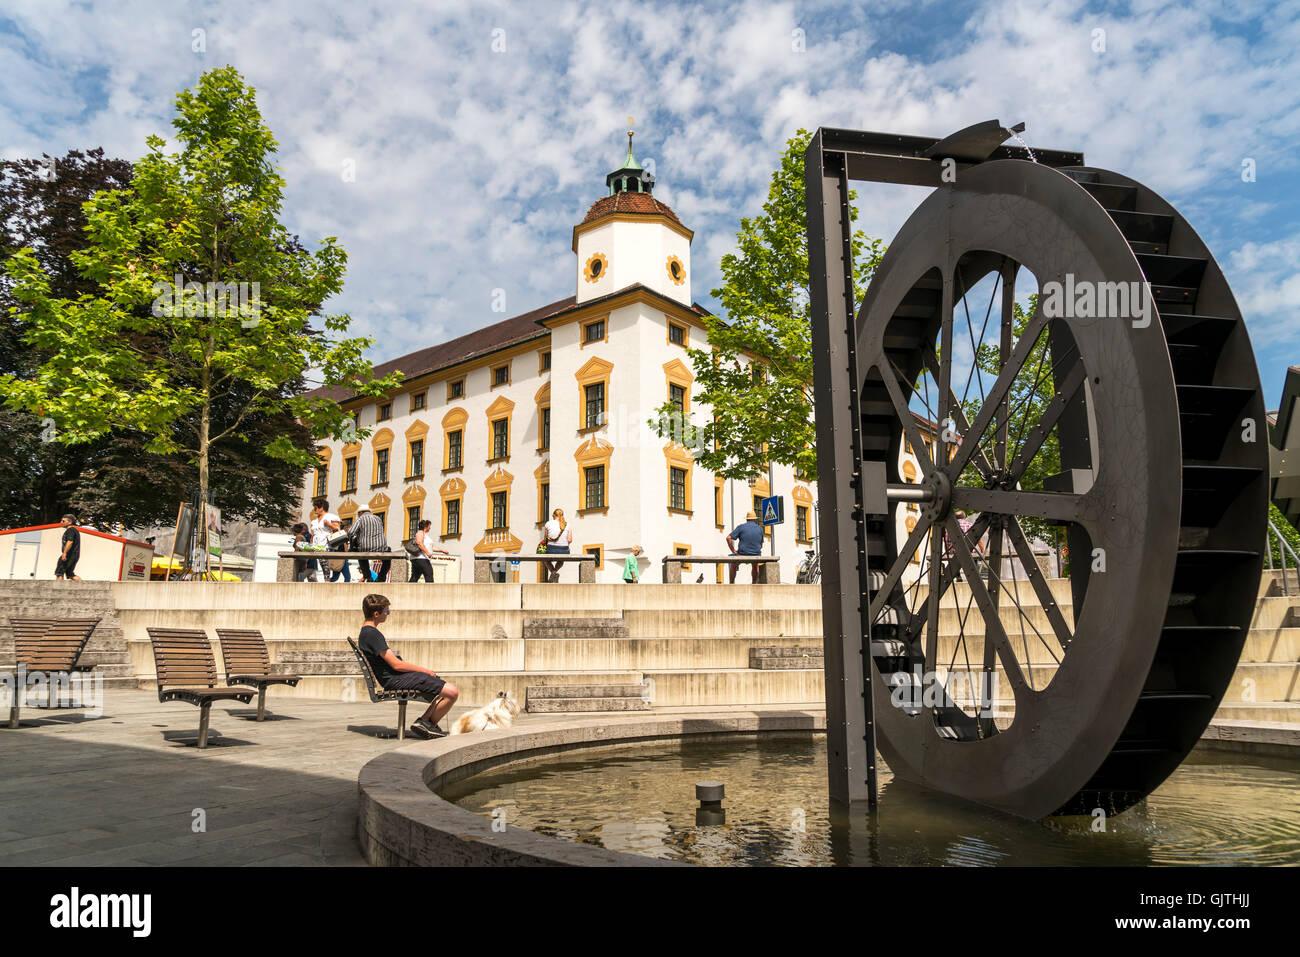 Water wheel and The Duke-Abbots' Residence in  Kempten, Allgäu, Bavaria, Germany - Stock Image